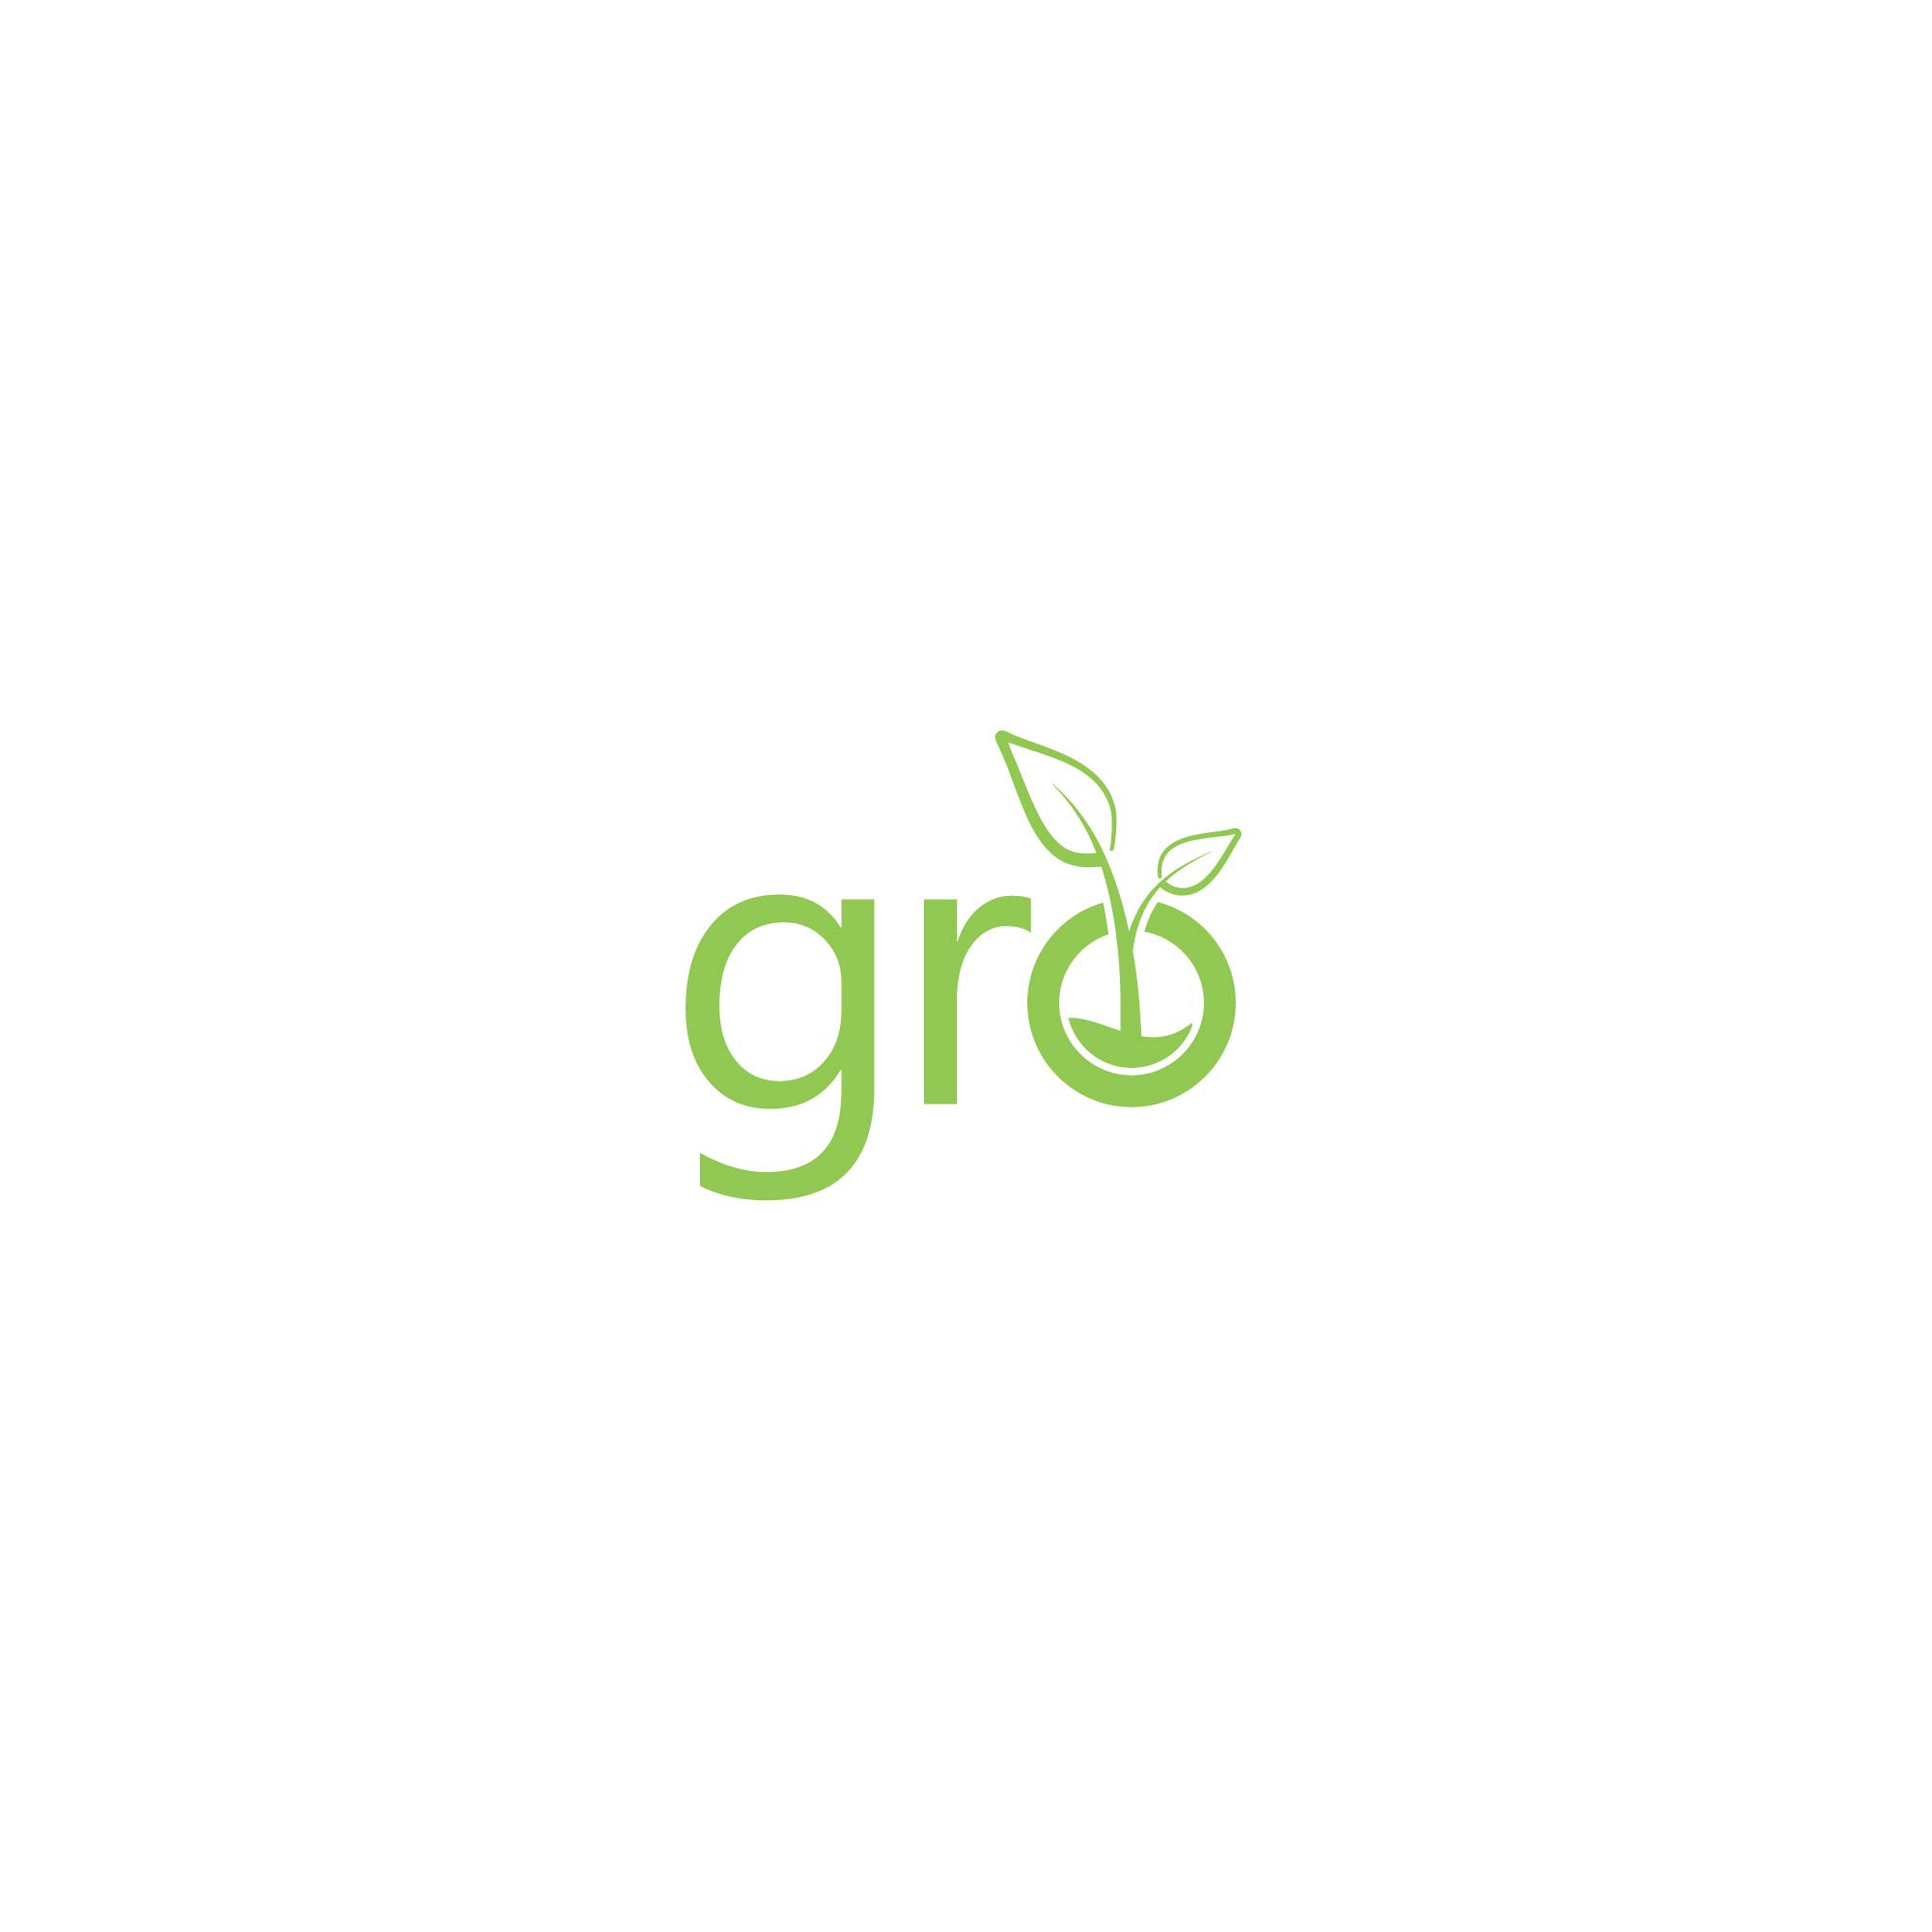 Tree planting non-profit needs simple logo